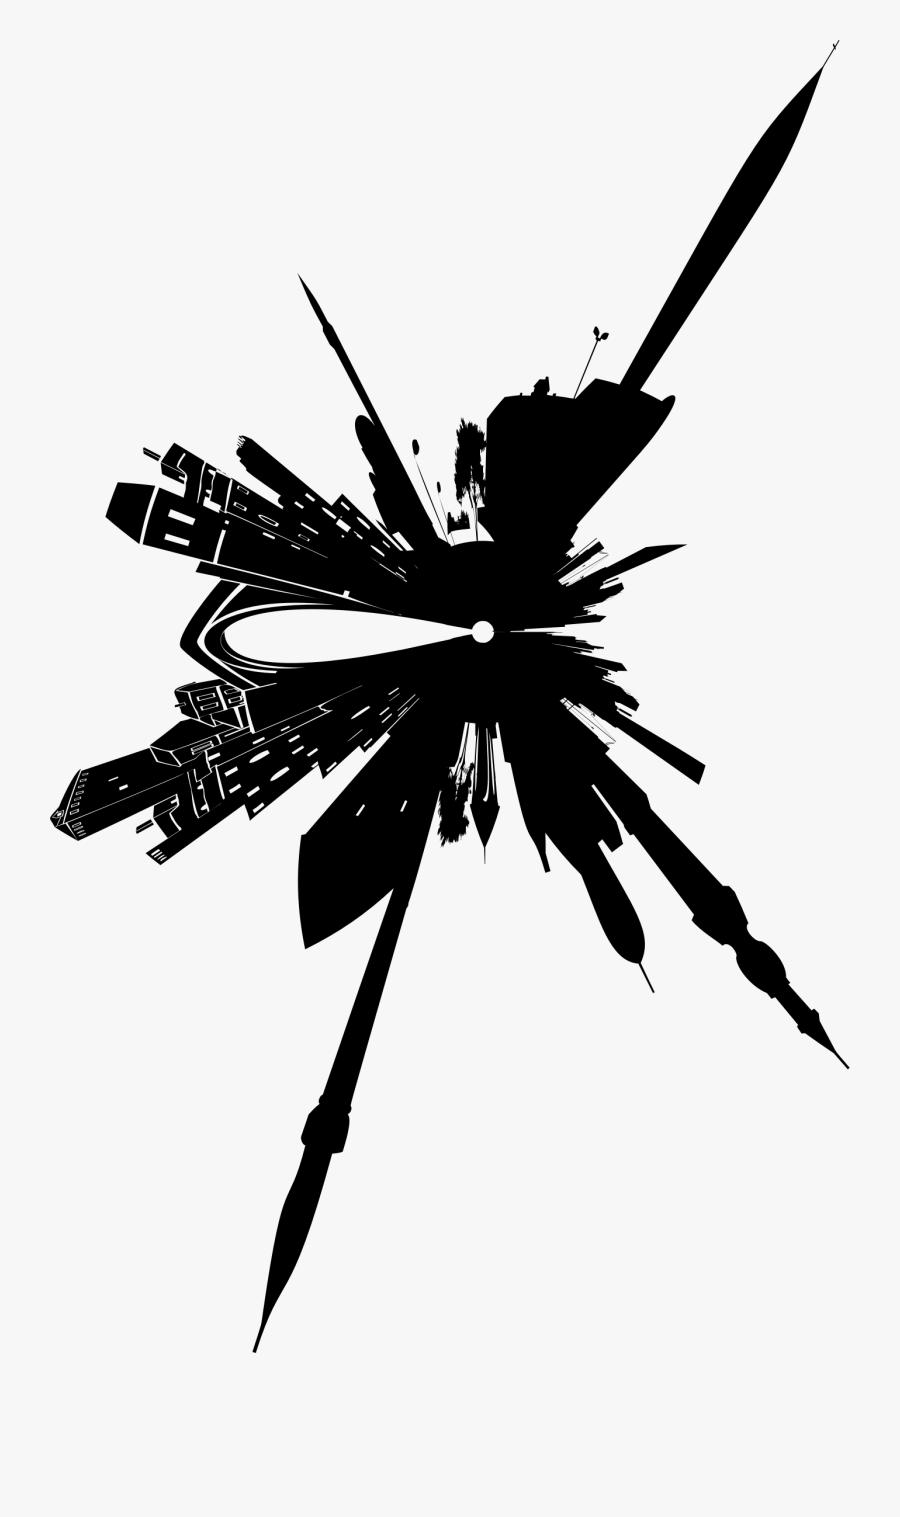 Silhouette Skyline Clip Art - Portable Network Graphics, Transparent Clipart